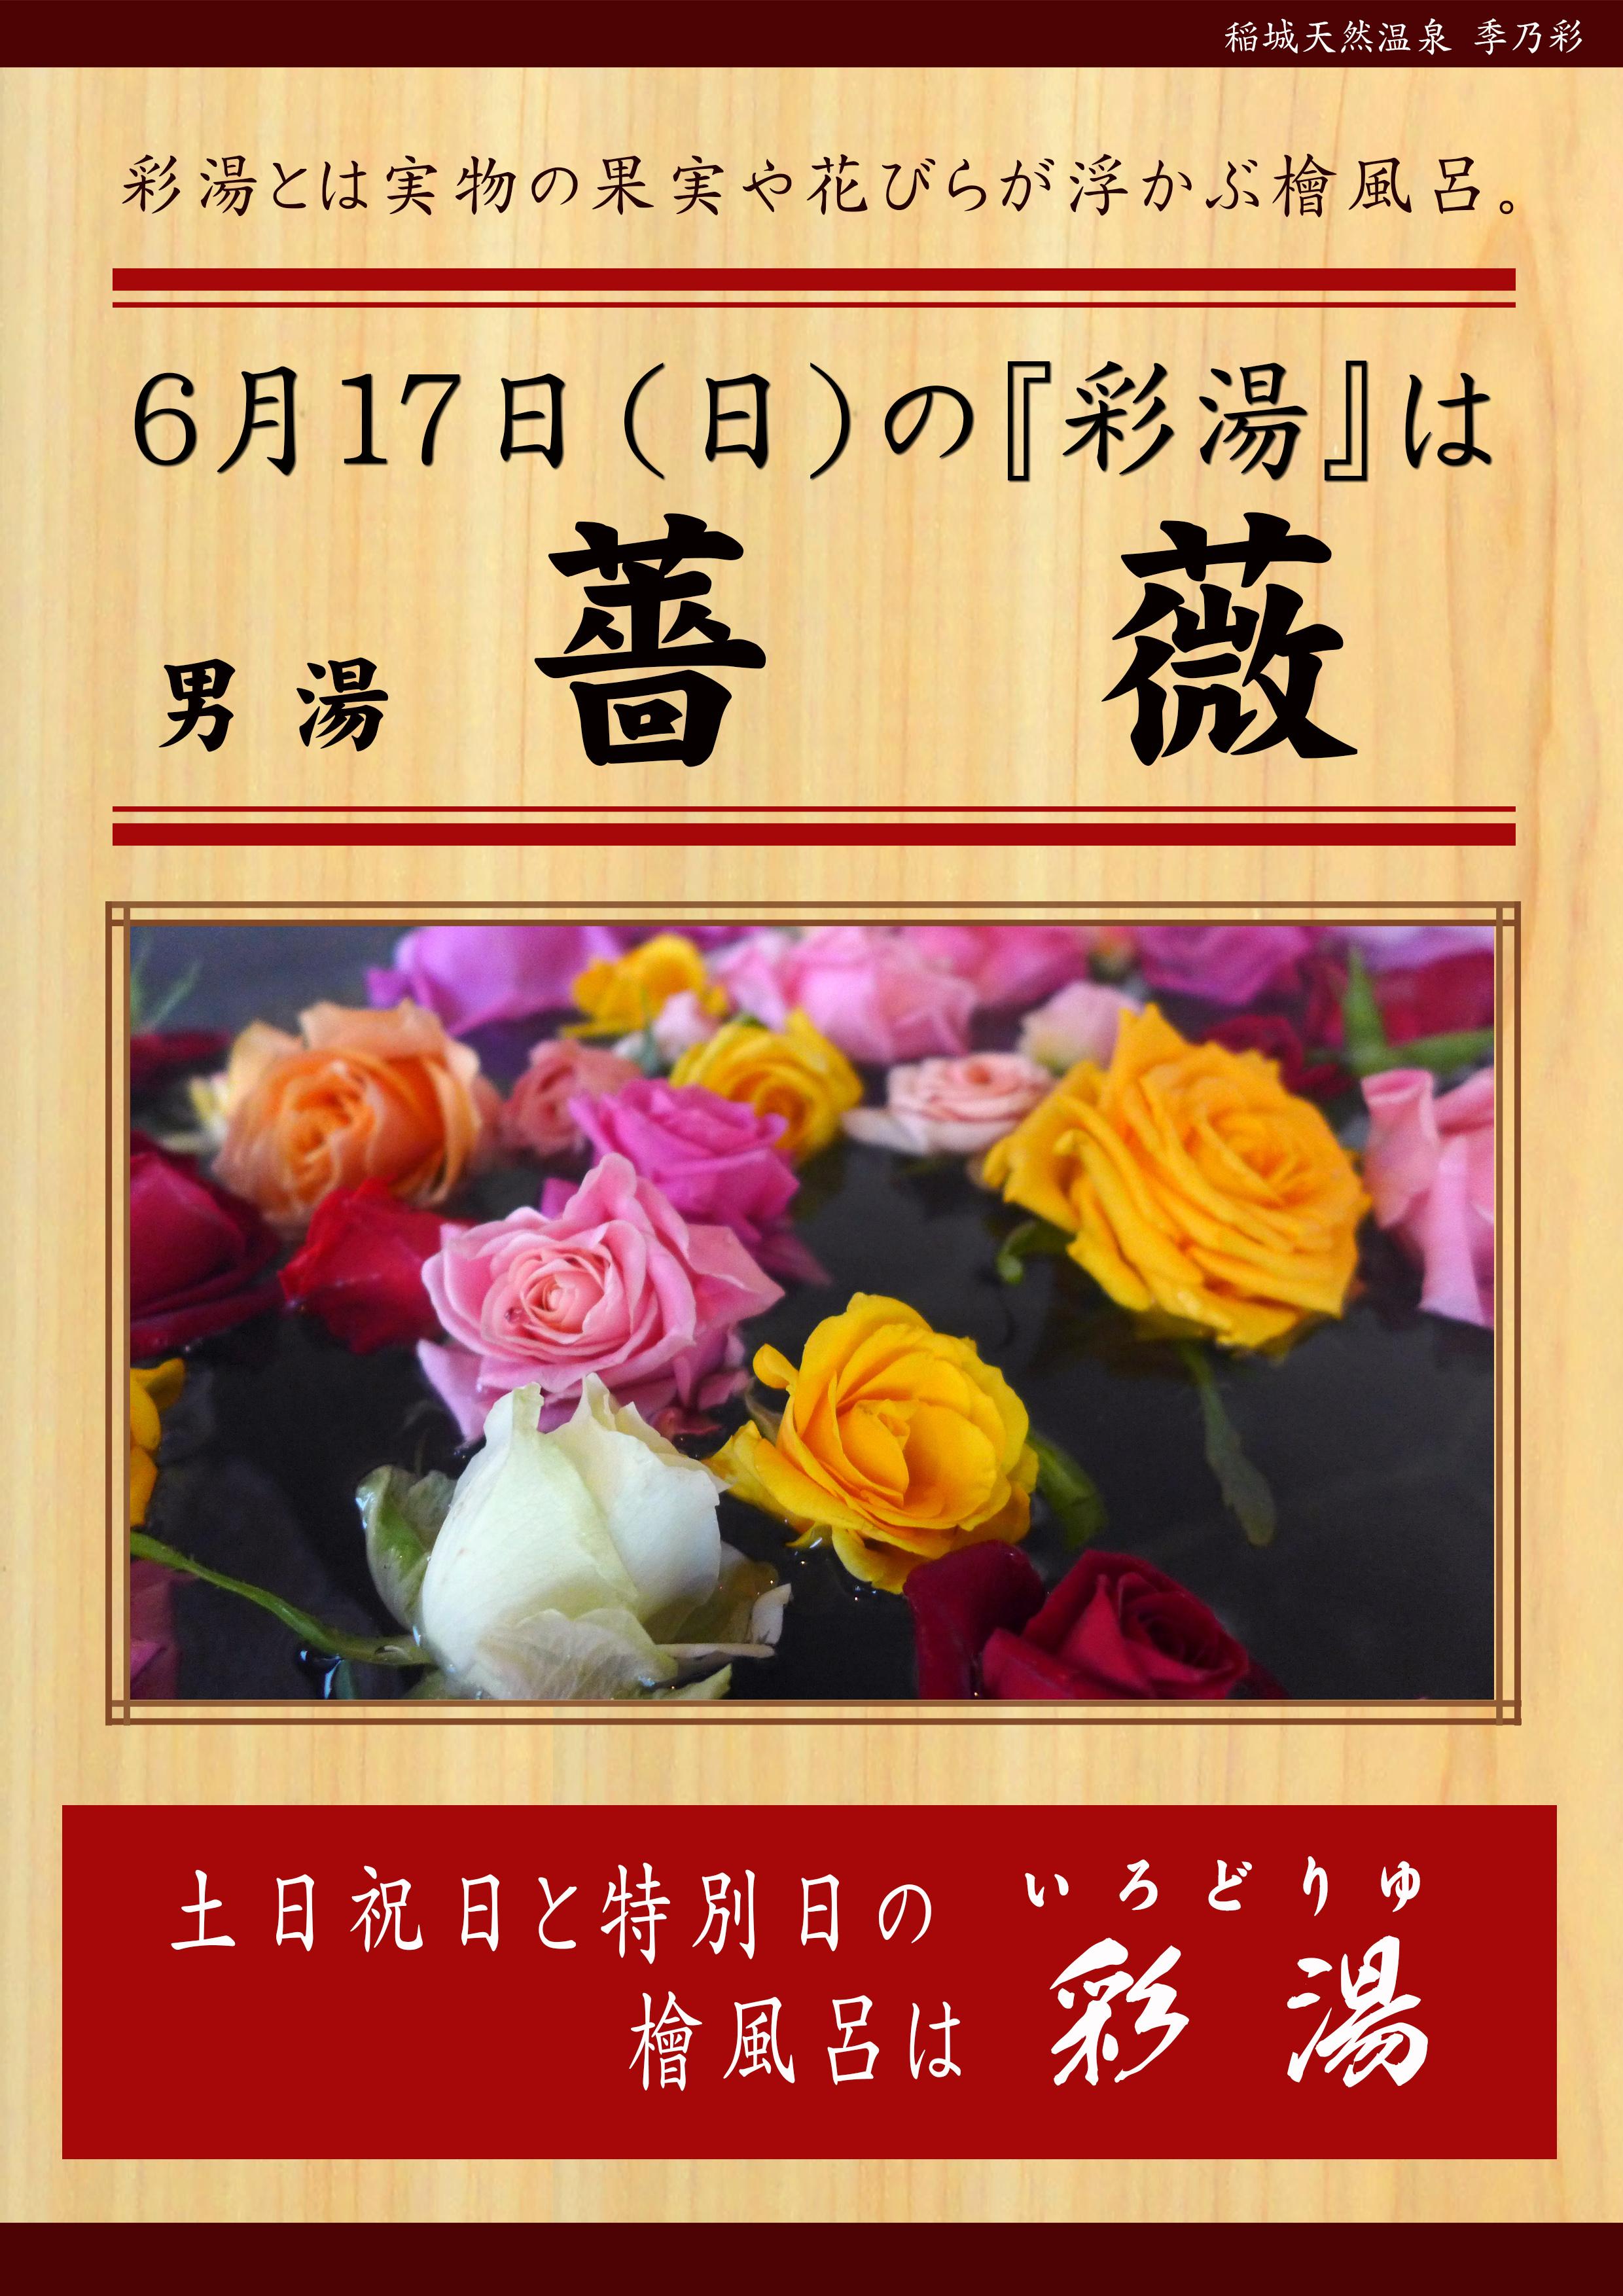 20180617POP イベント 彩湯 男湯 薔薇